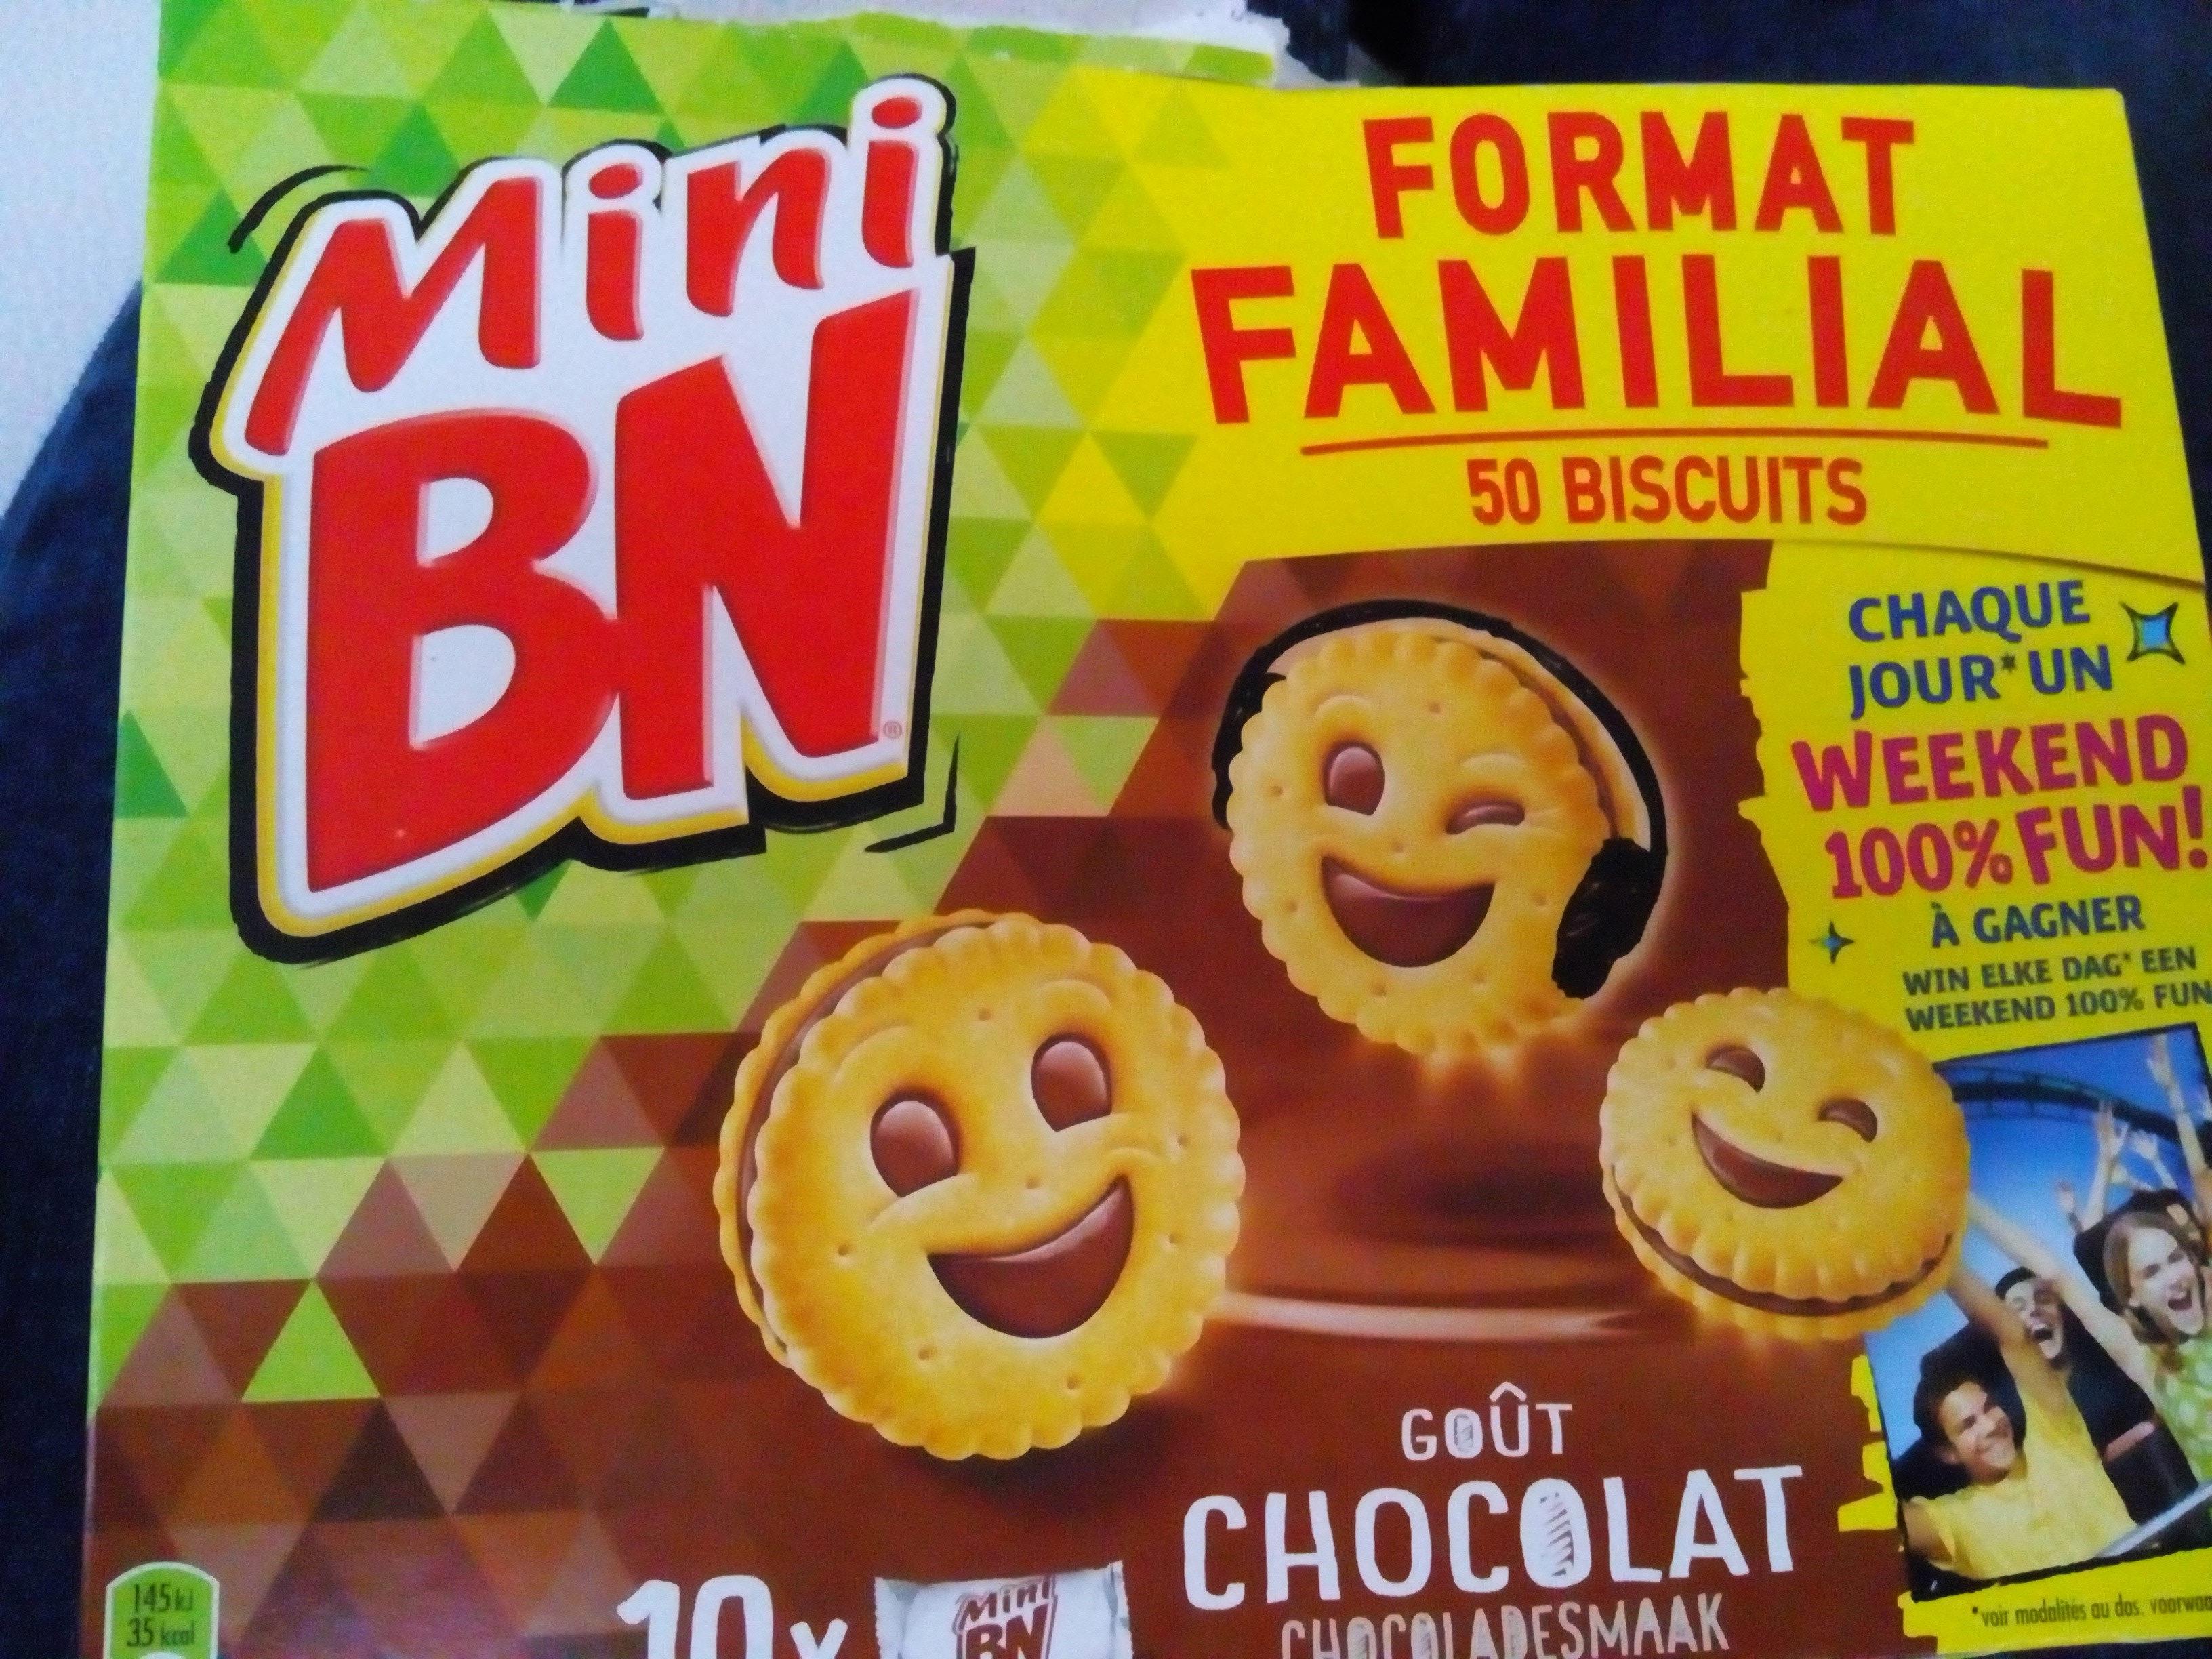 Calorie bn chocolat - Borocarbide